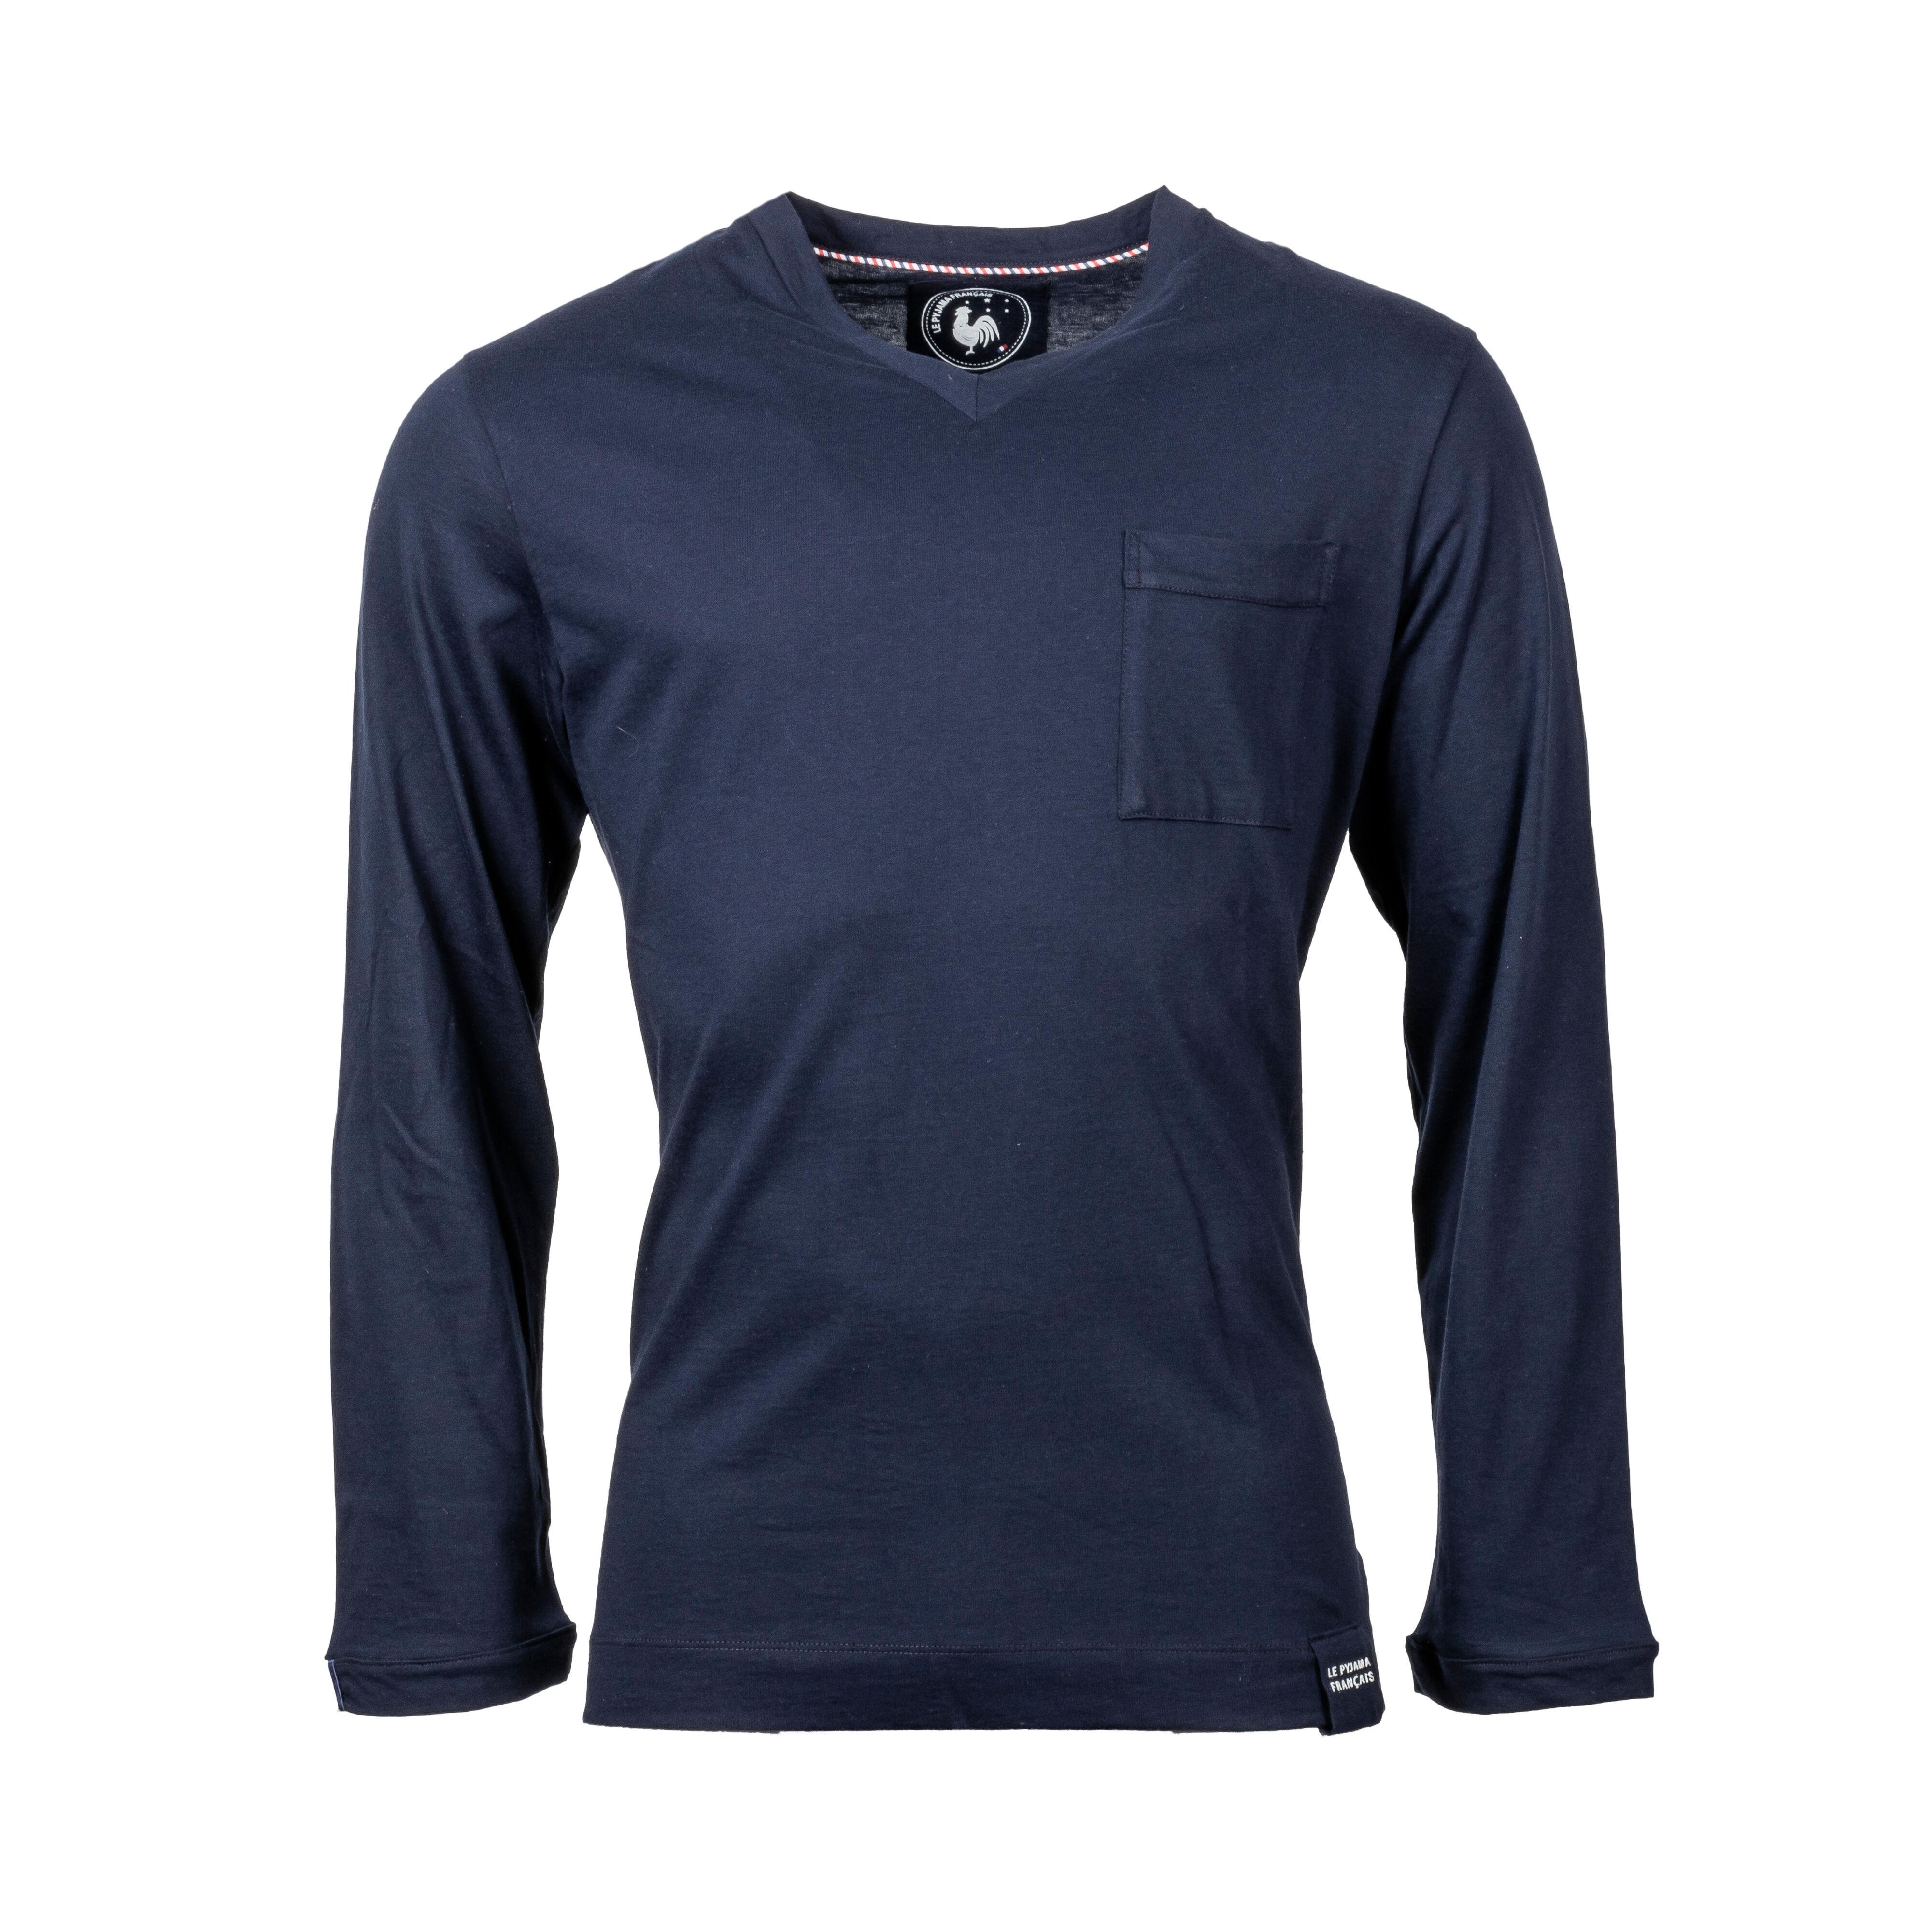 Le Pyjama Français Tee-shirt de pyjama manches longues Made in France Le Pyjama Français en coton bleu marine - BLEU - XL